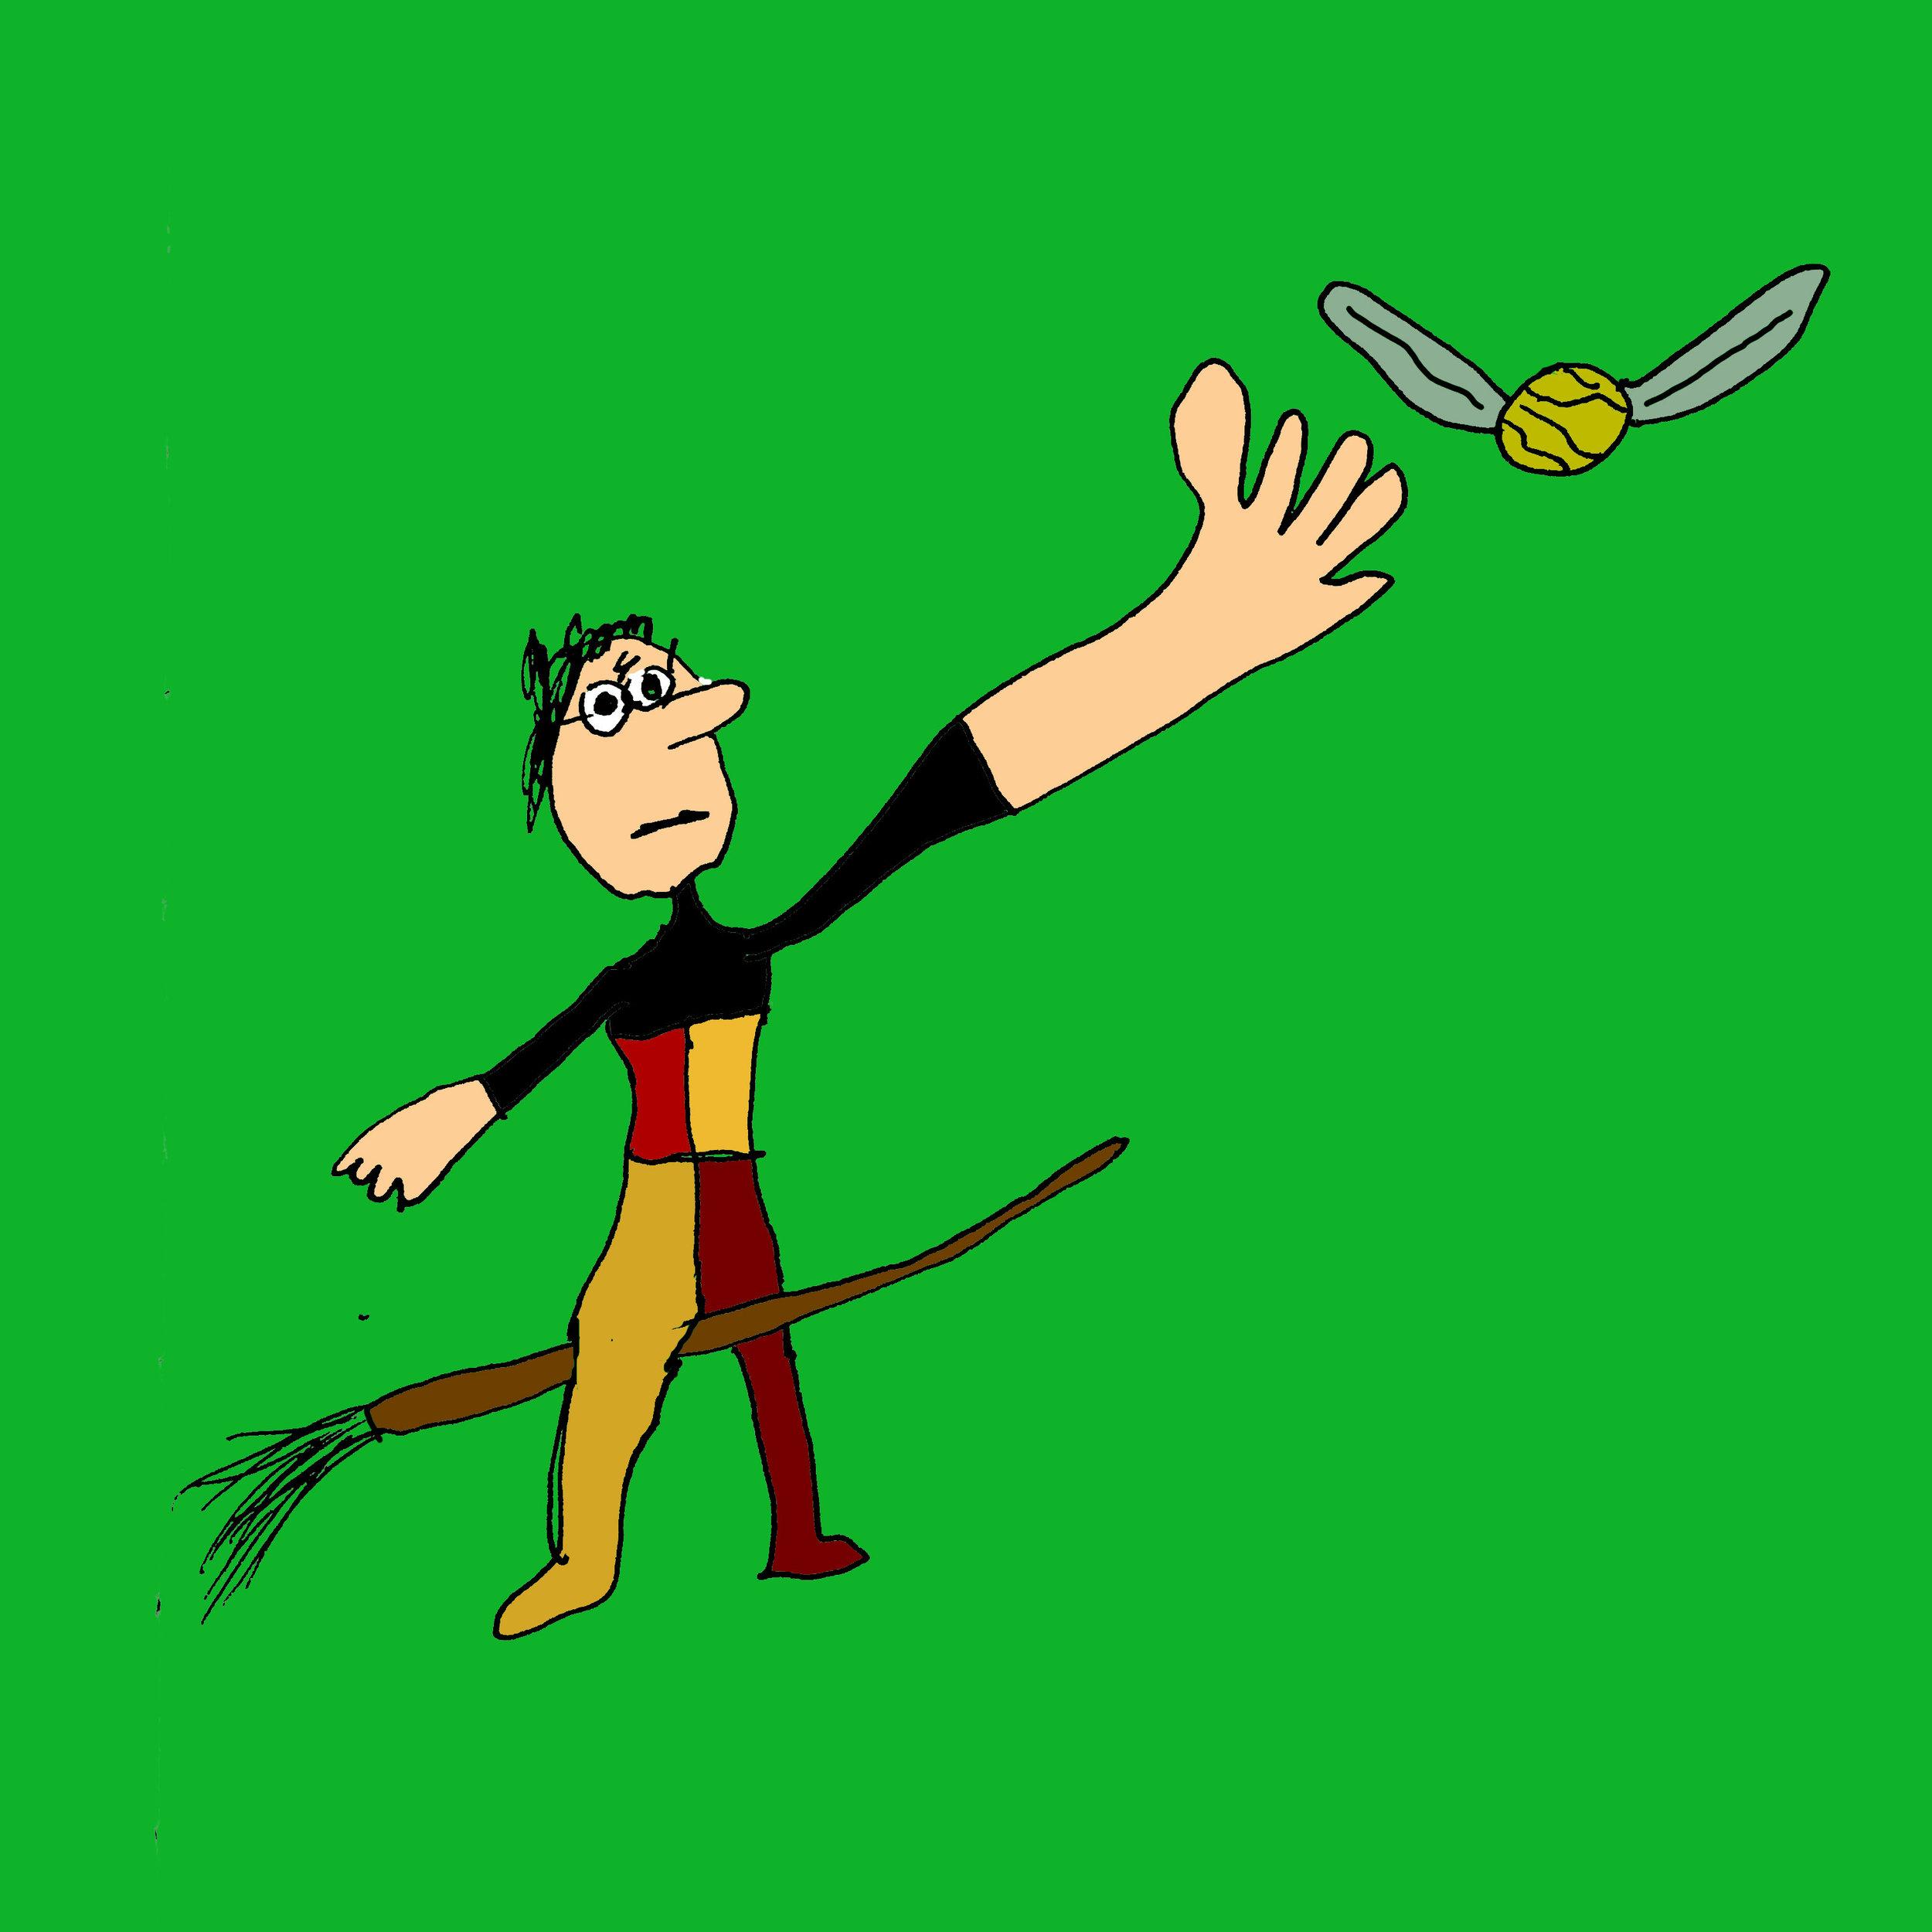 Harry-Playing-Quidditch.jpg